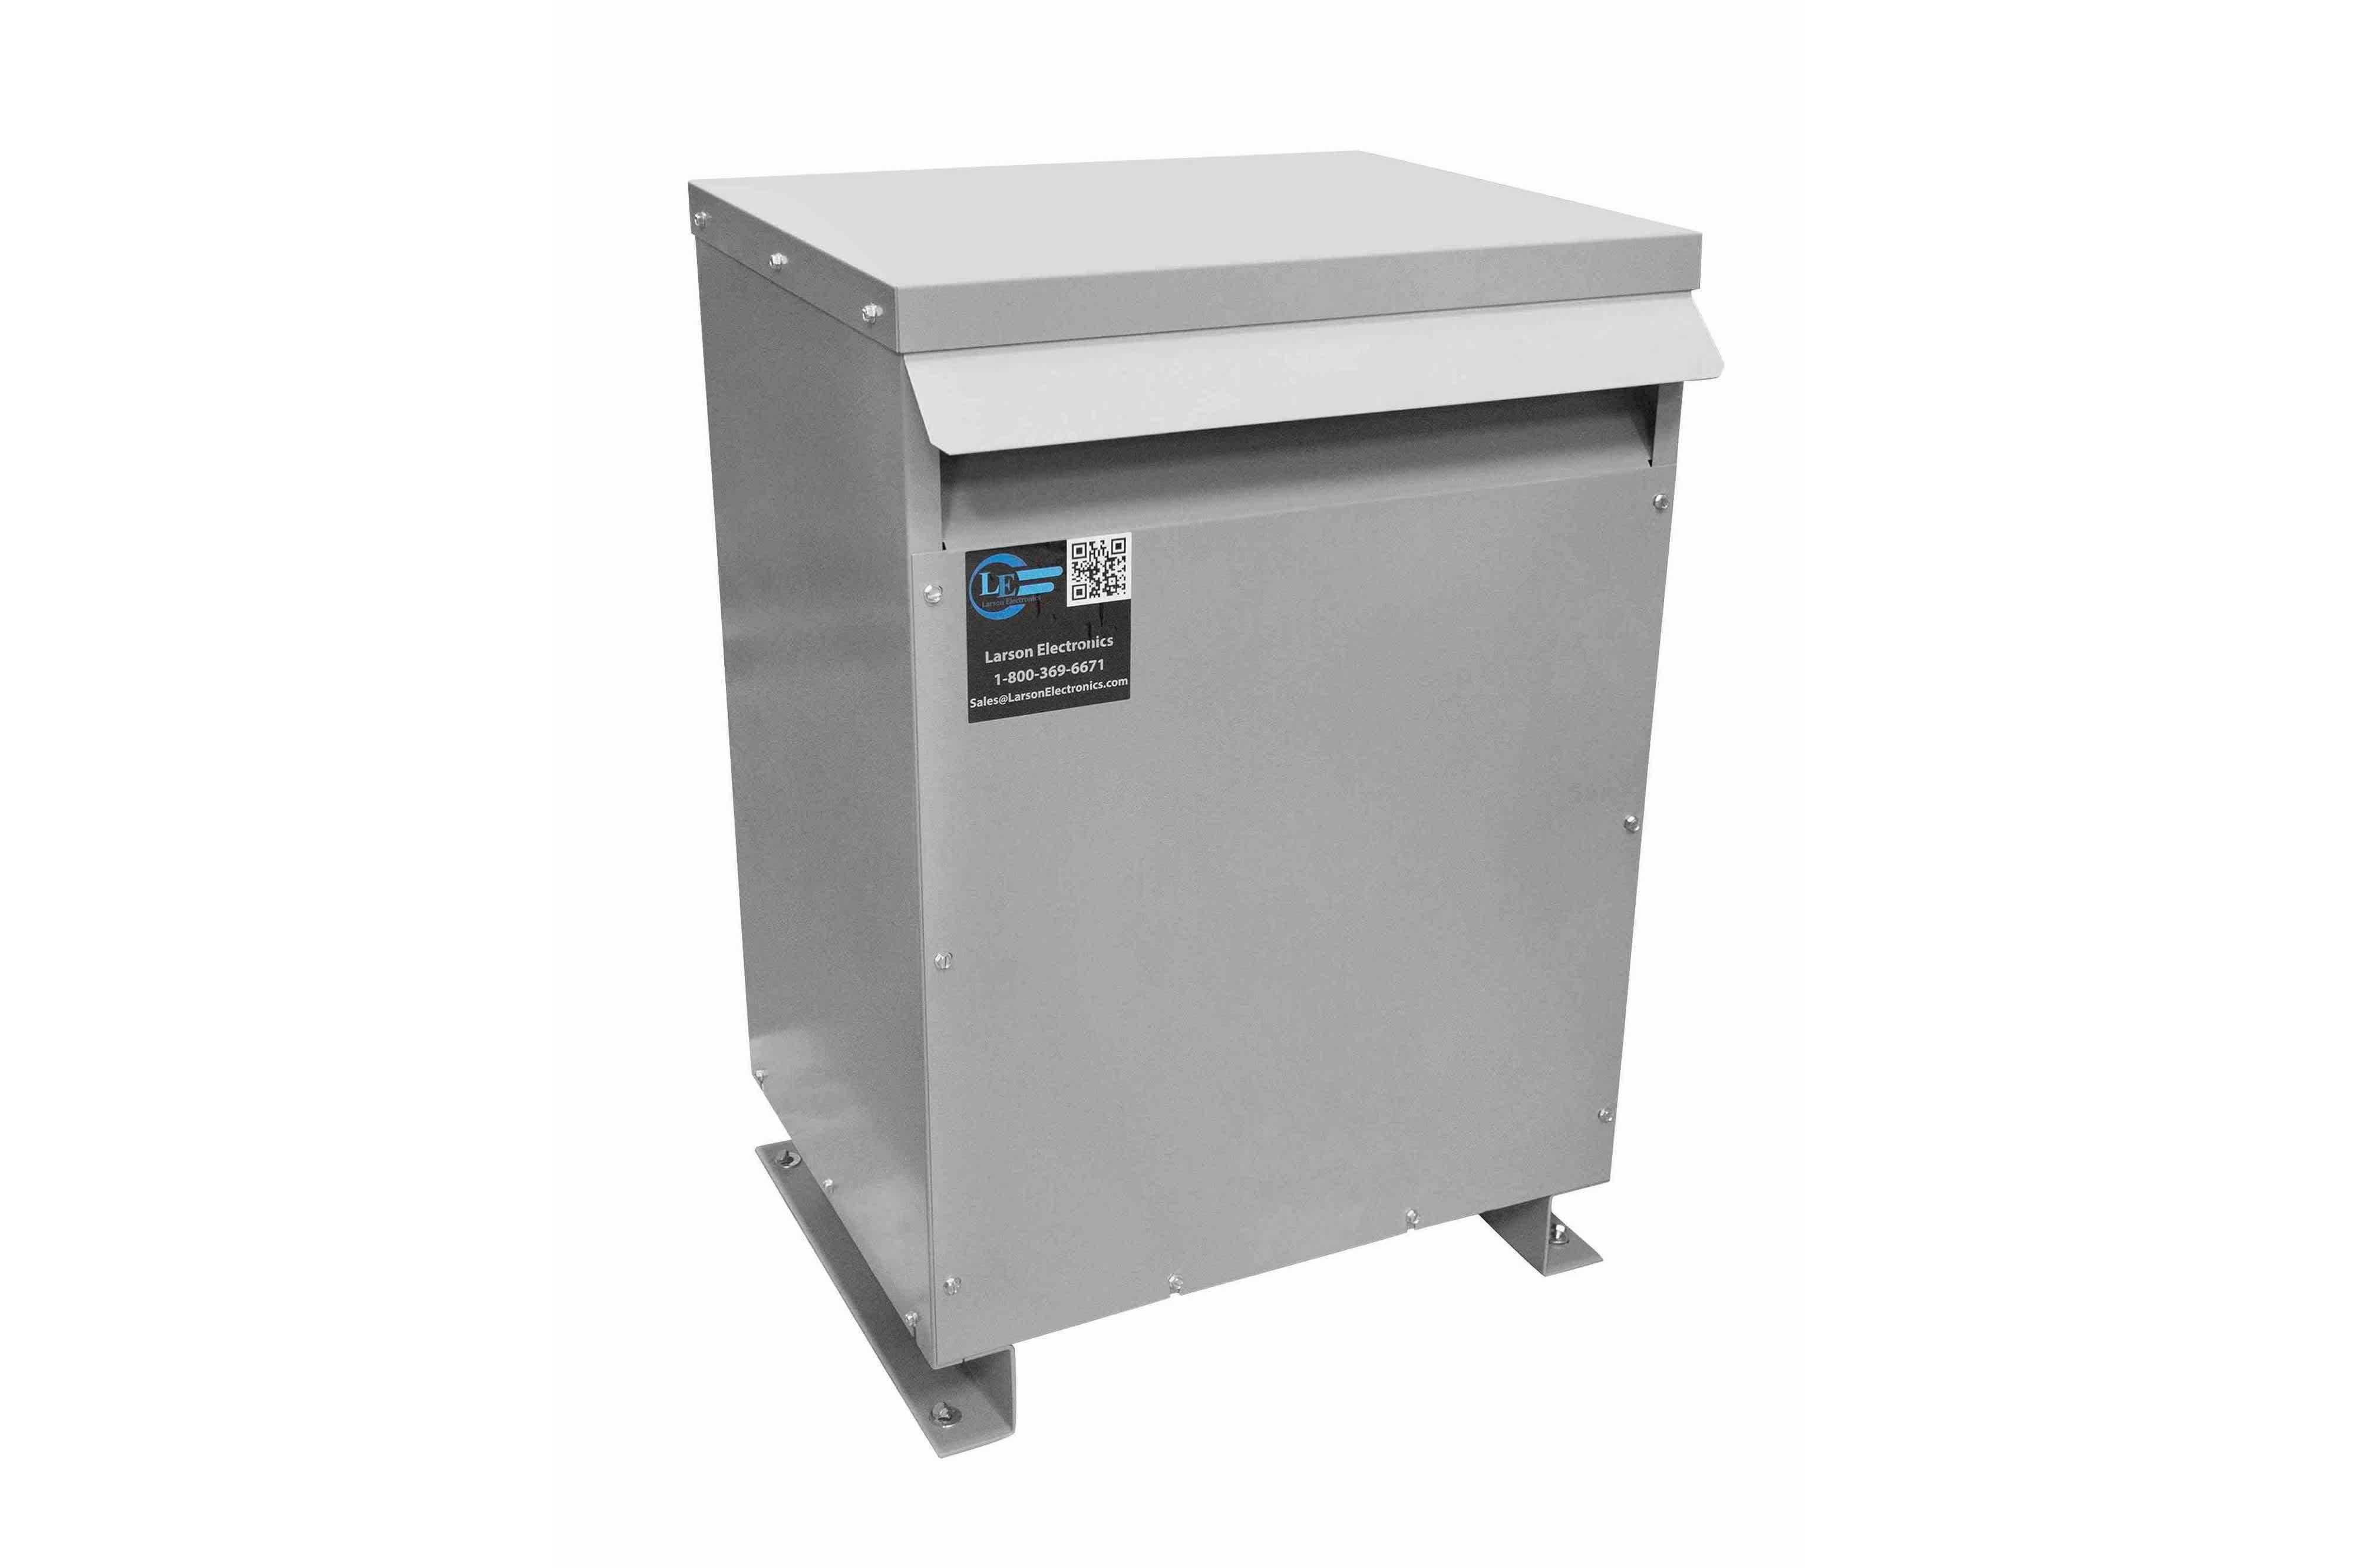 750 kVA 3PH DOE Transformer, 480V Delta Primary, 415Y/240 Wye-N Secondary, N3R, Ventilated, 60 Hz